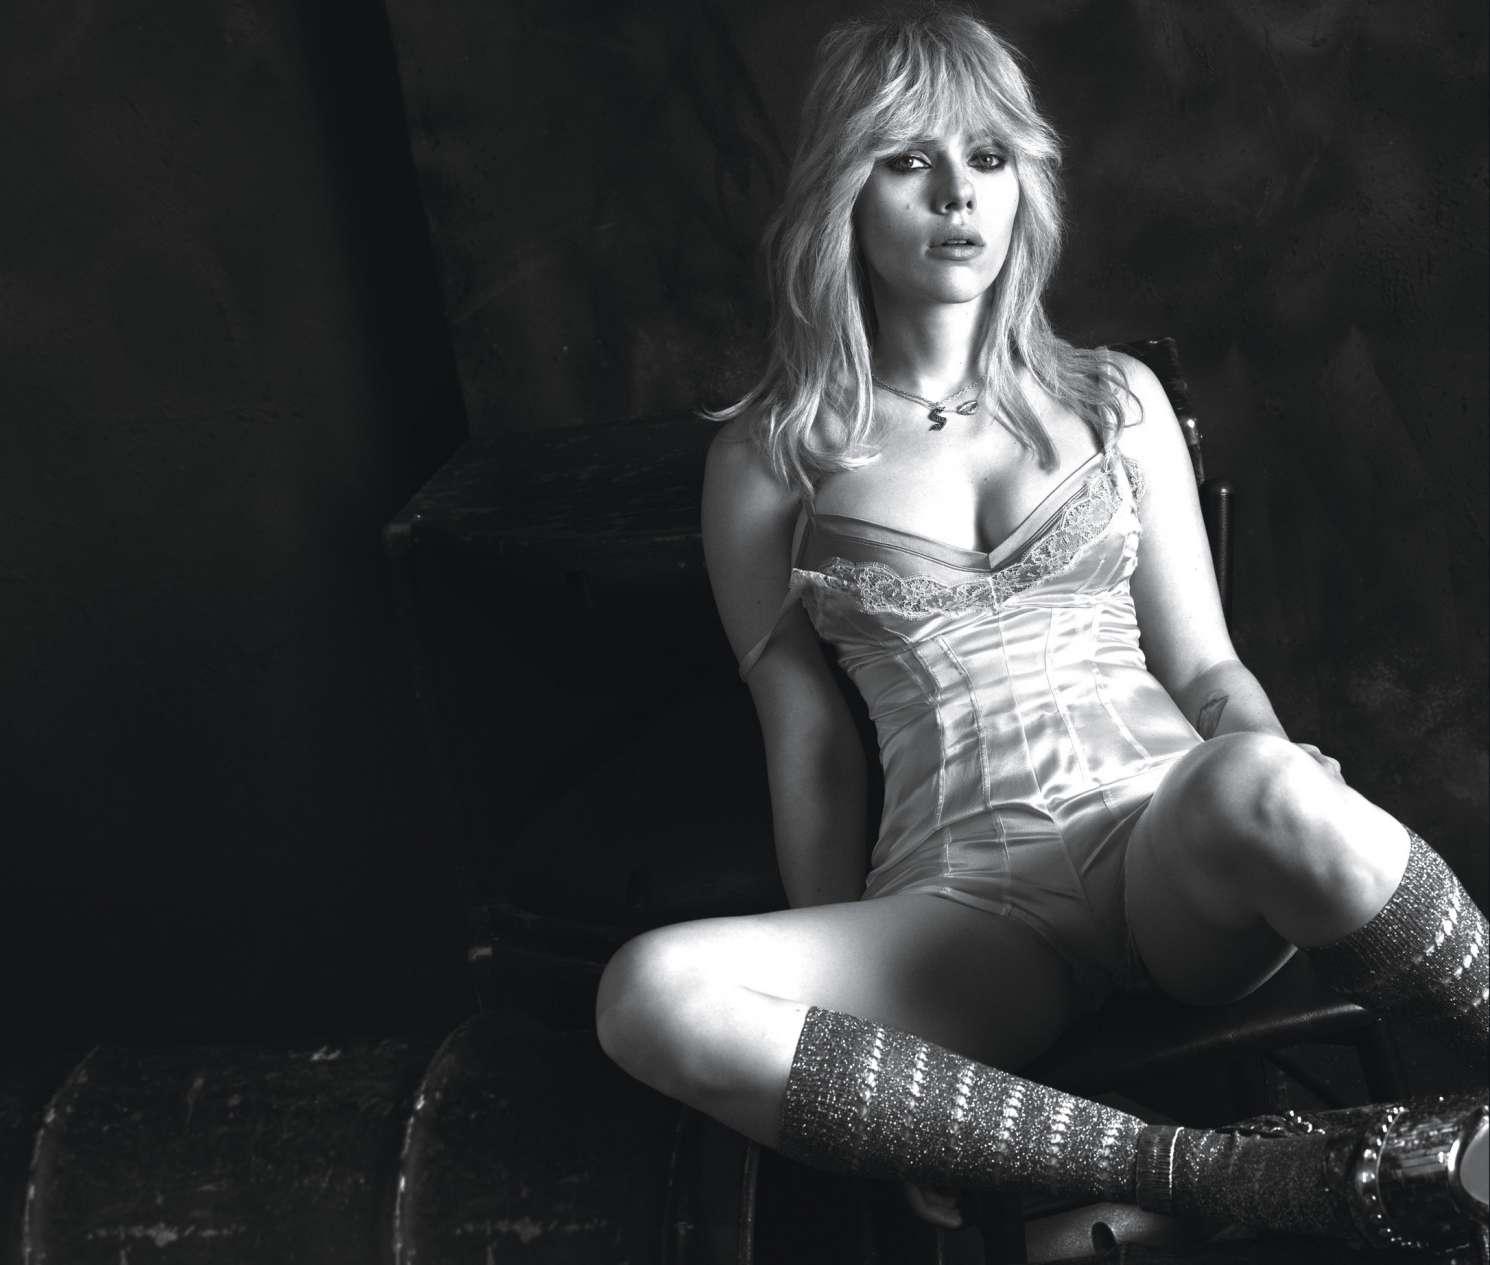 sexy6.jpg